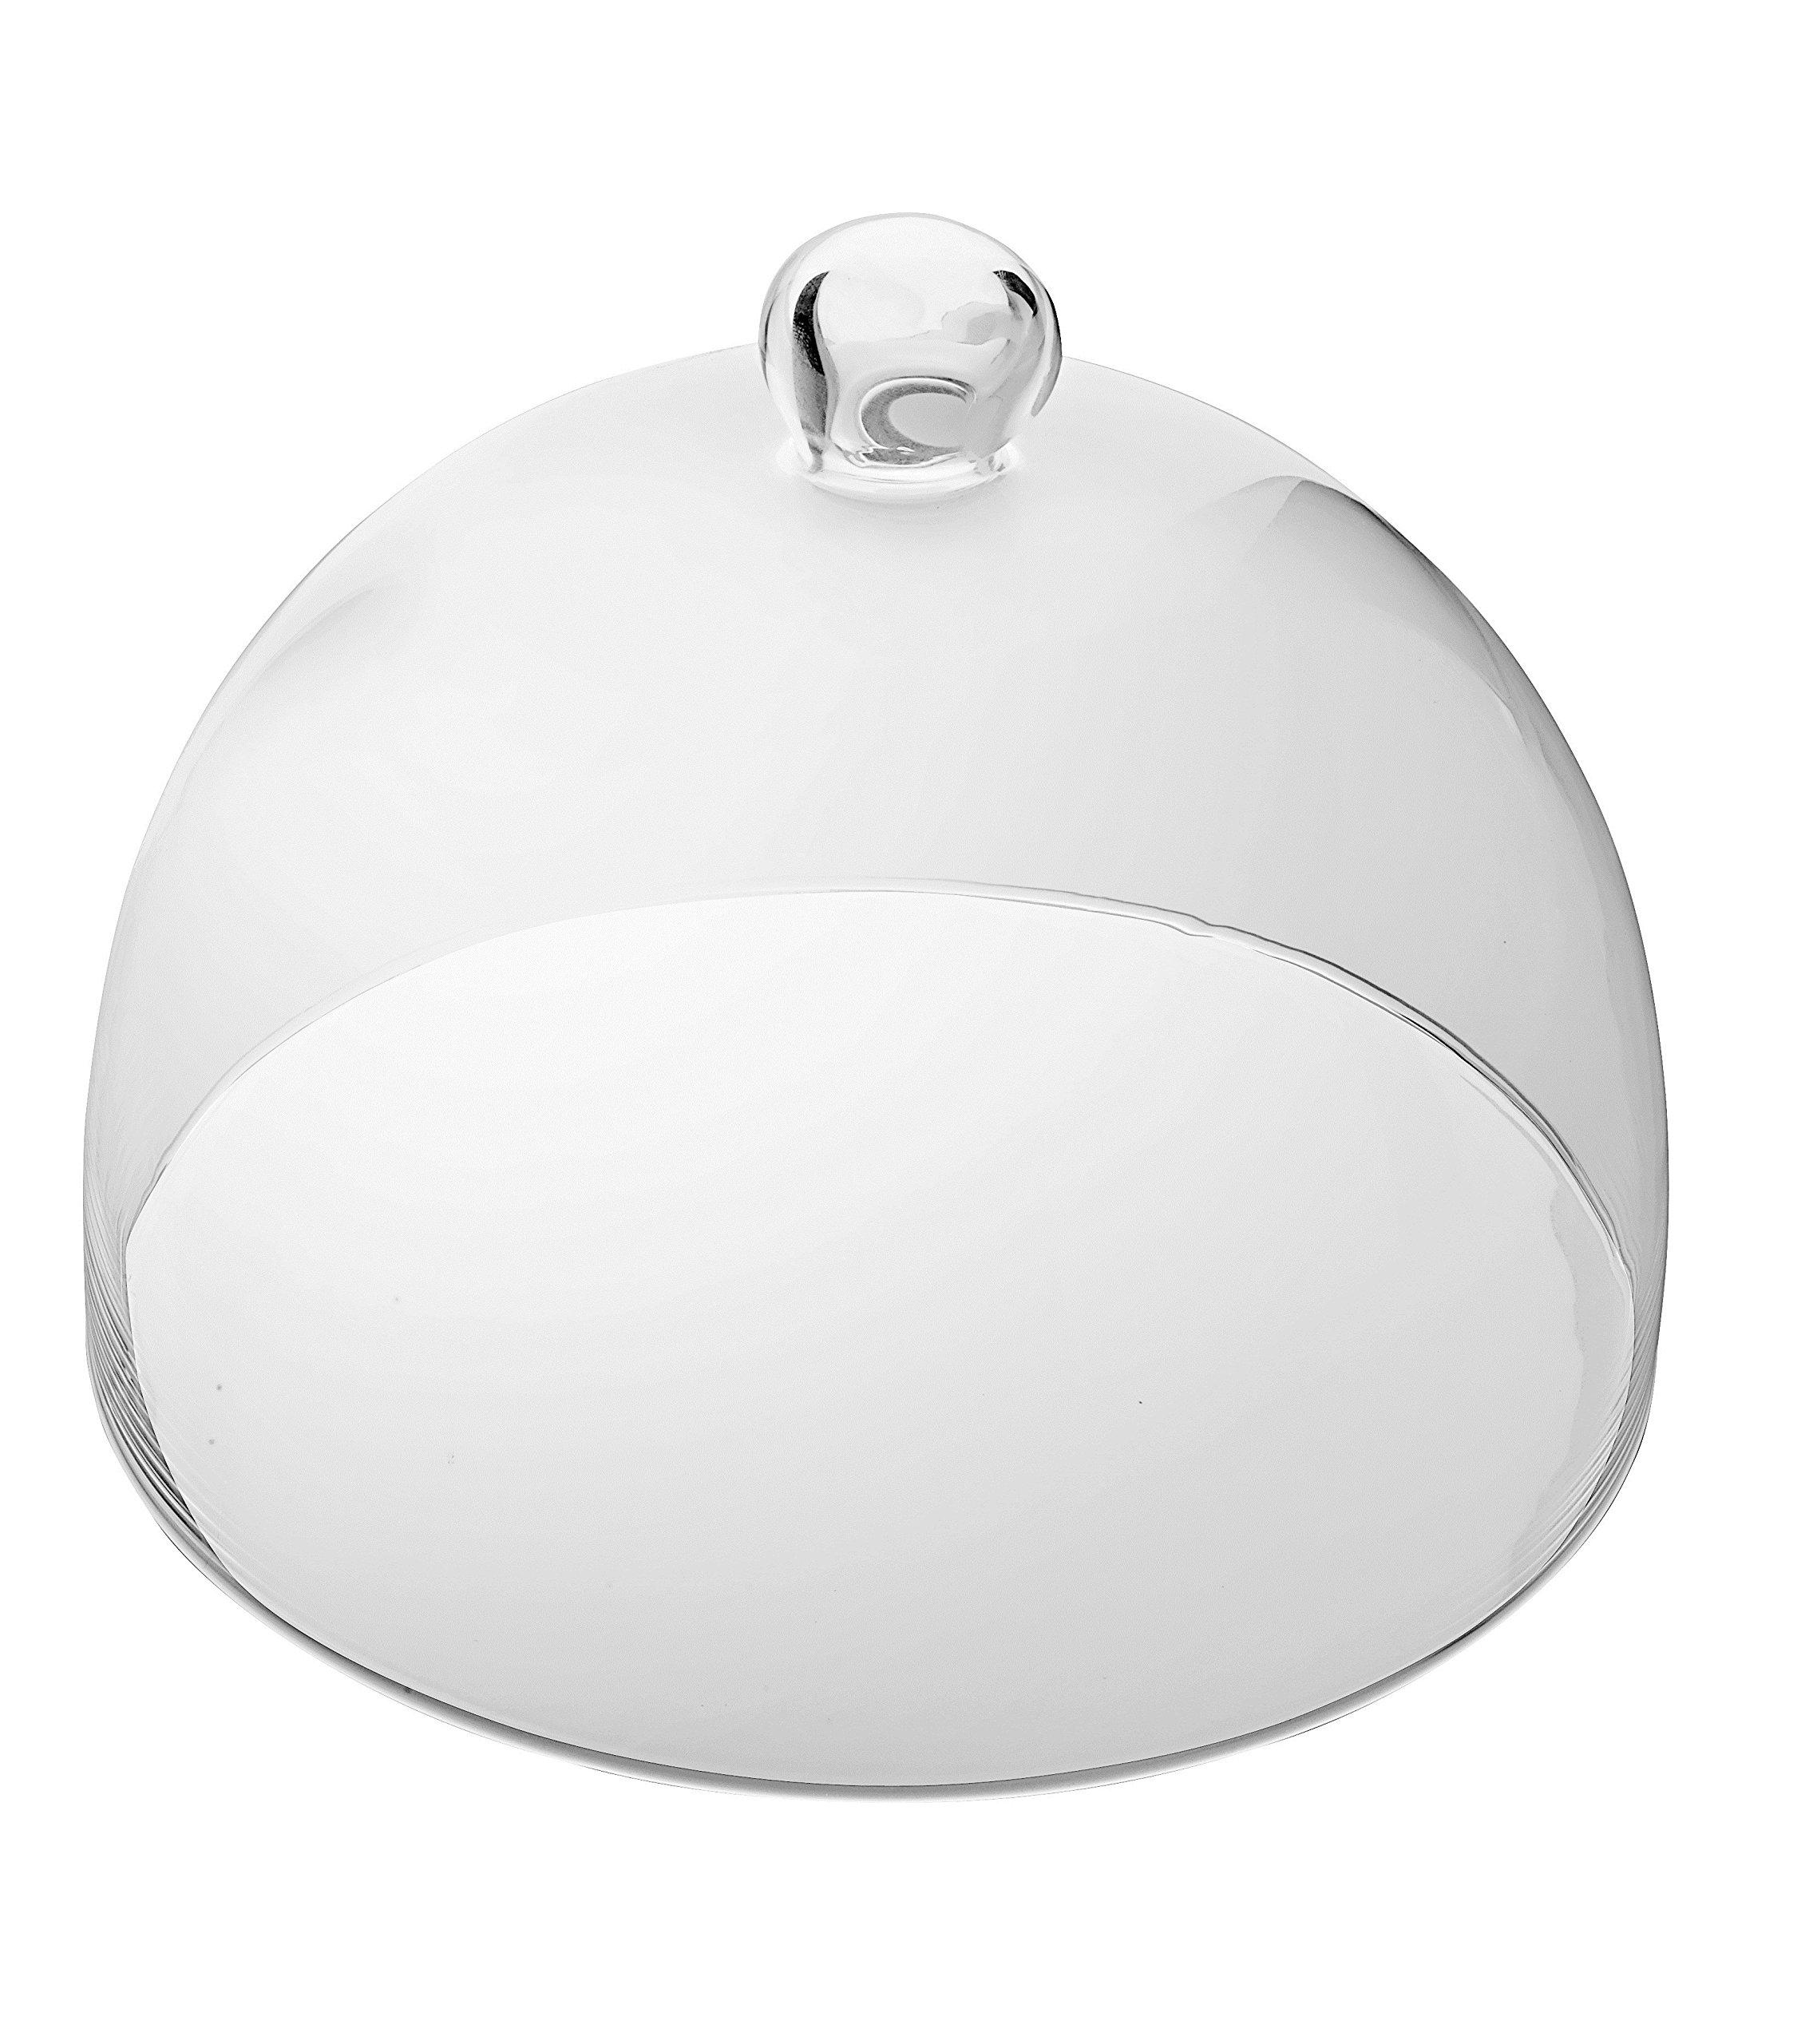 Barski - European - Handmade Glass - Cake Dome - 11'' Diameter - Made in Europe